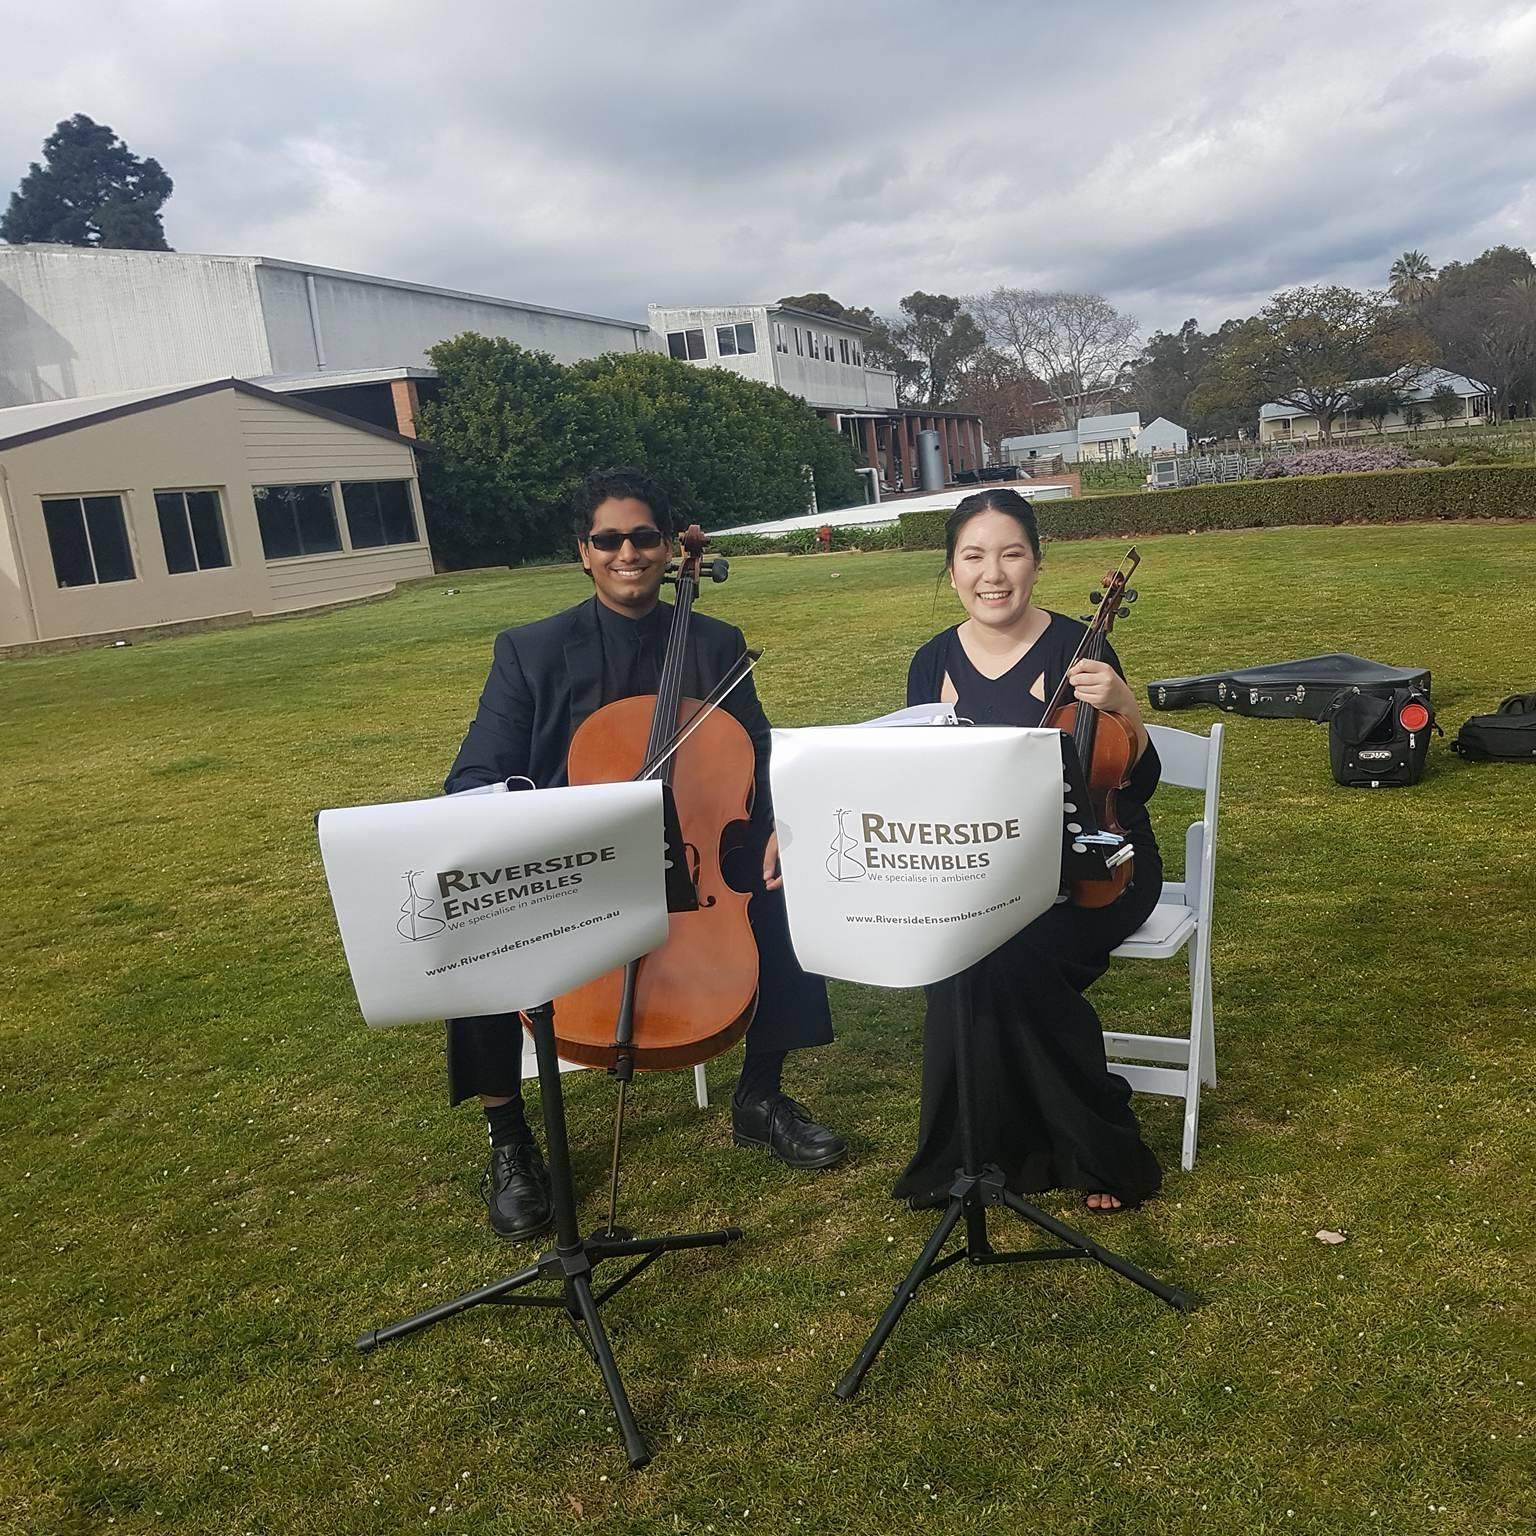 AA String Quartet Trio Harp Perth Wedding Music DJ www.RiversideEnsembles.com.au (6).jpg